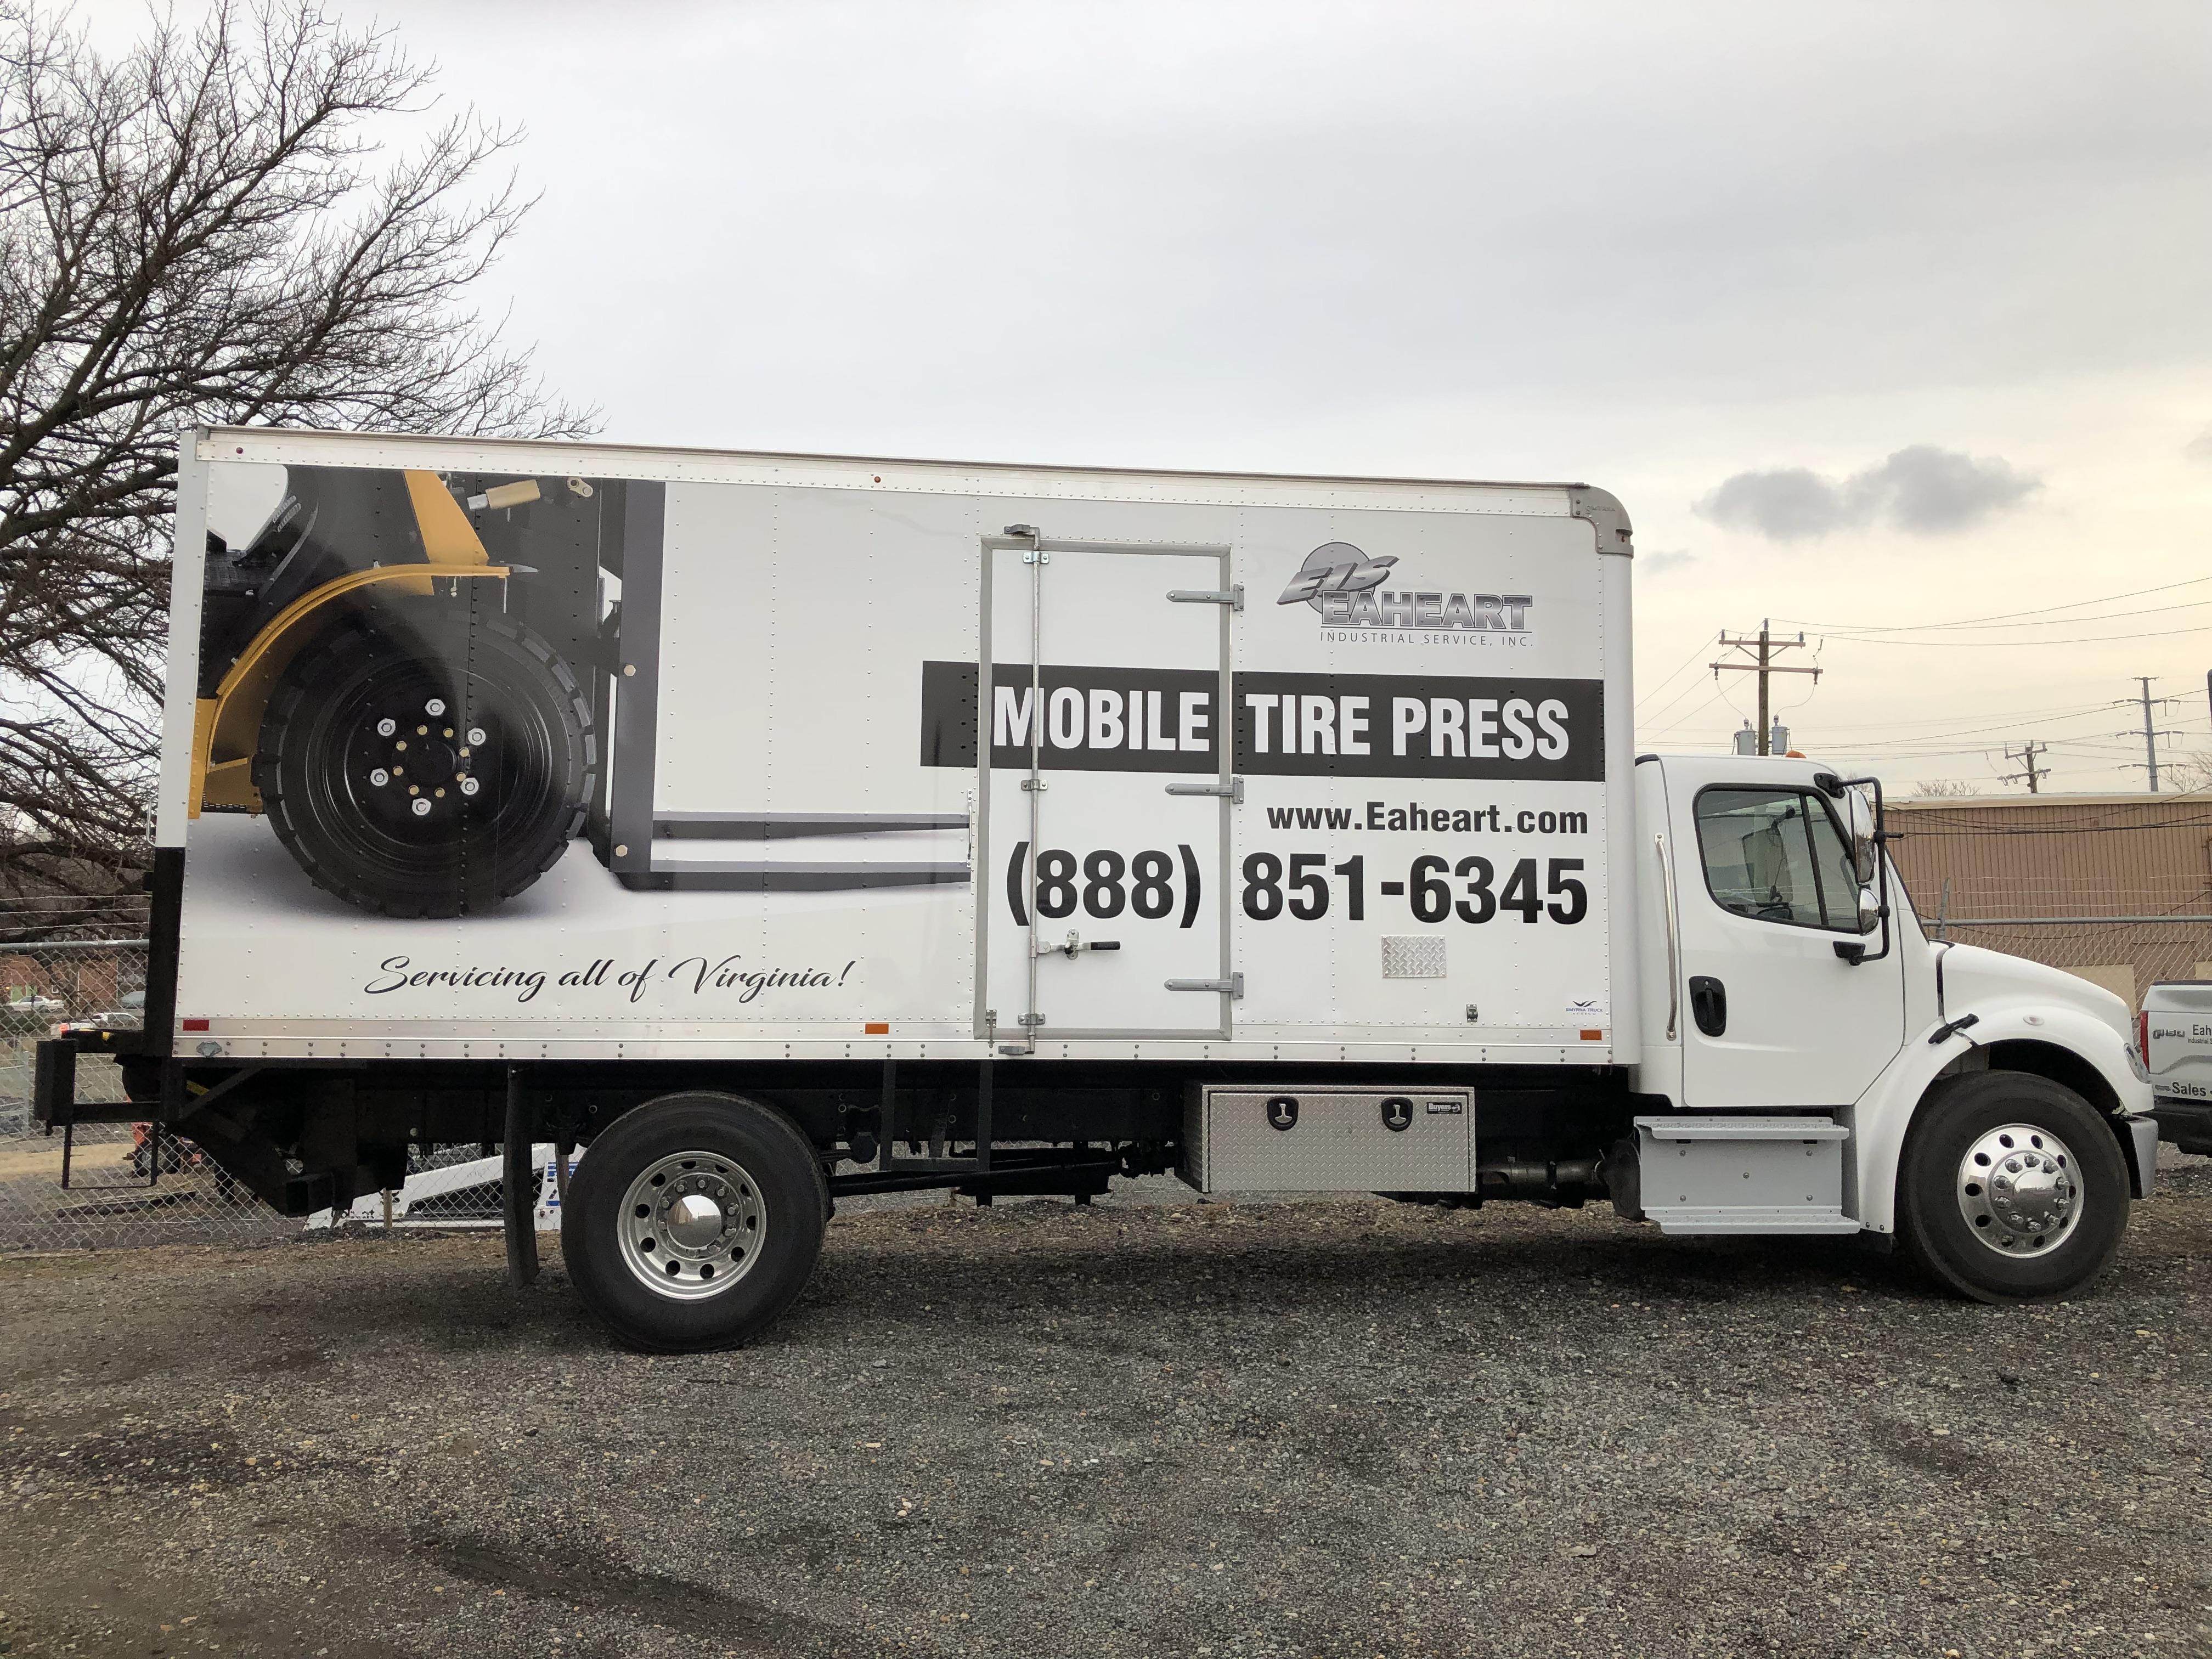 Mobile Tire Service >> Mobile Tire Press Service In Virginia Eaheart